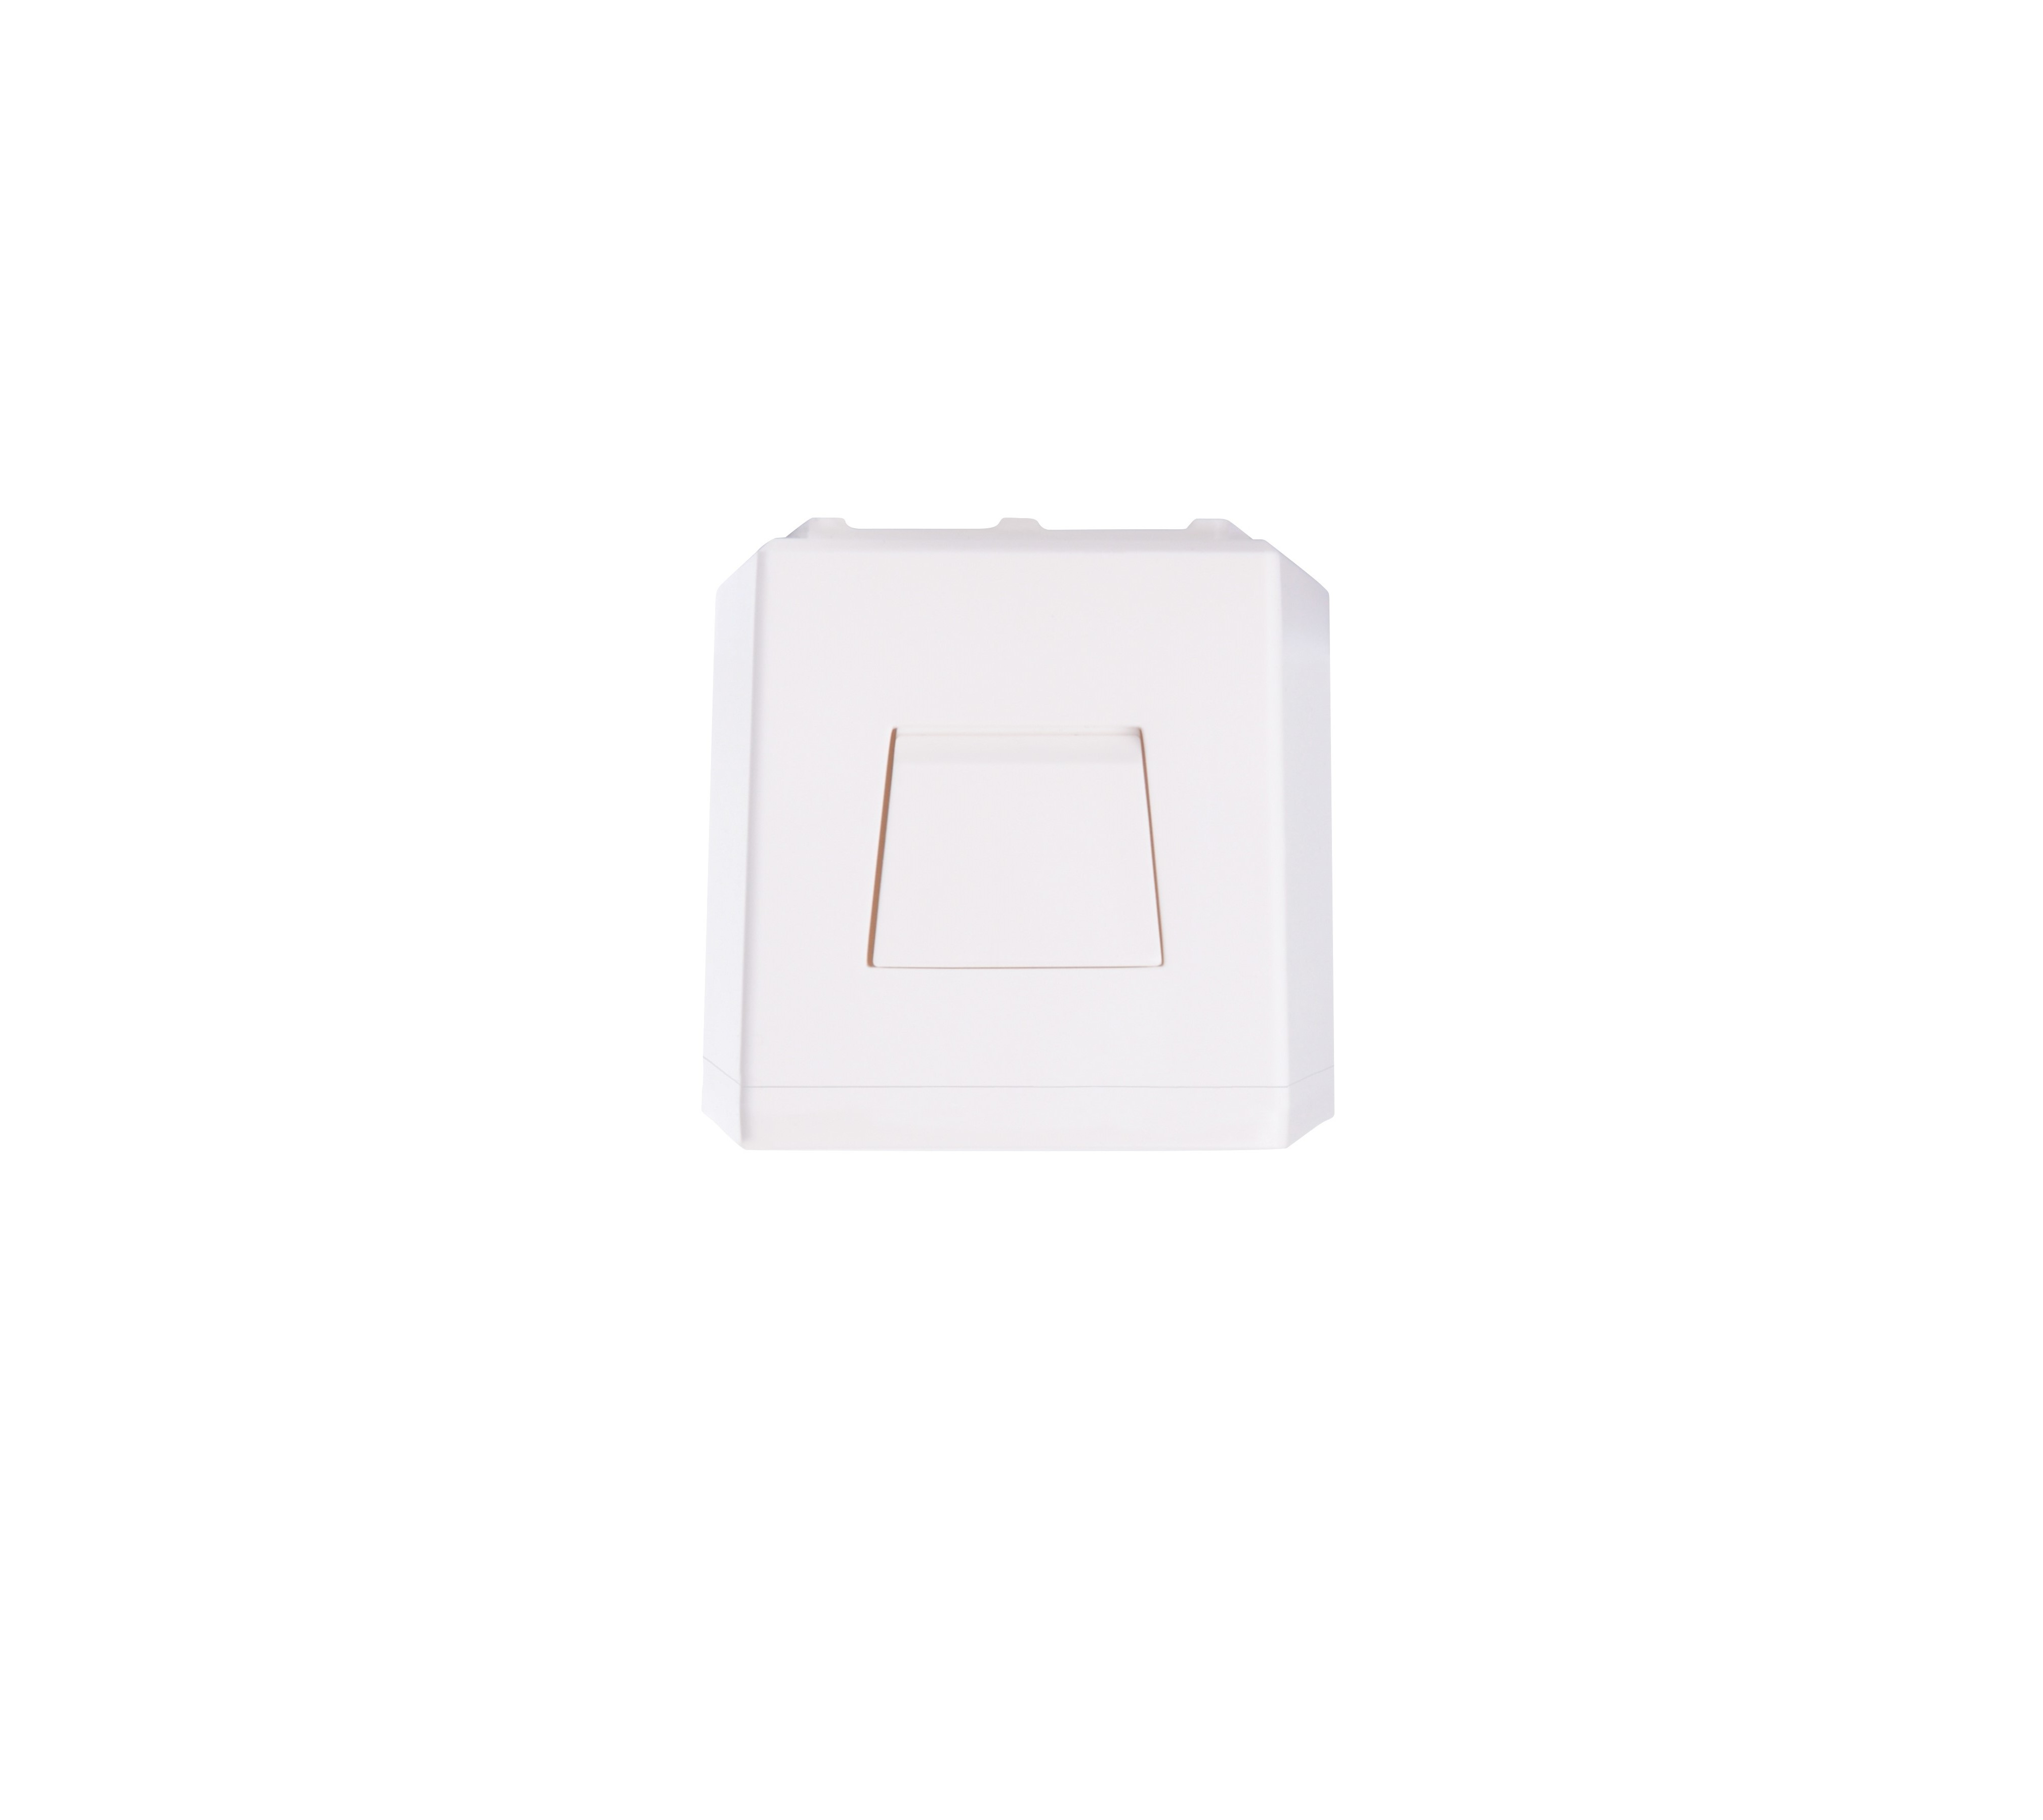 Lampa emergenta led Intelight 94517   3h mentinut test automat1